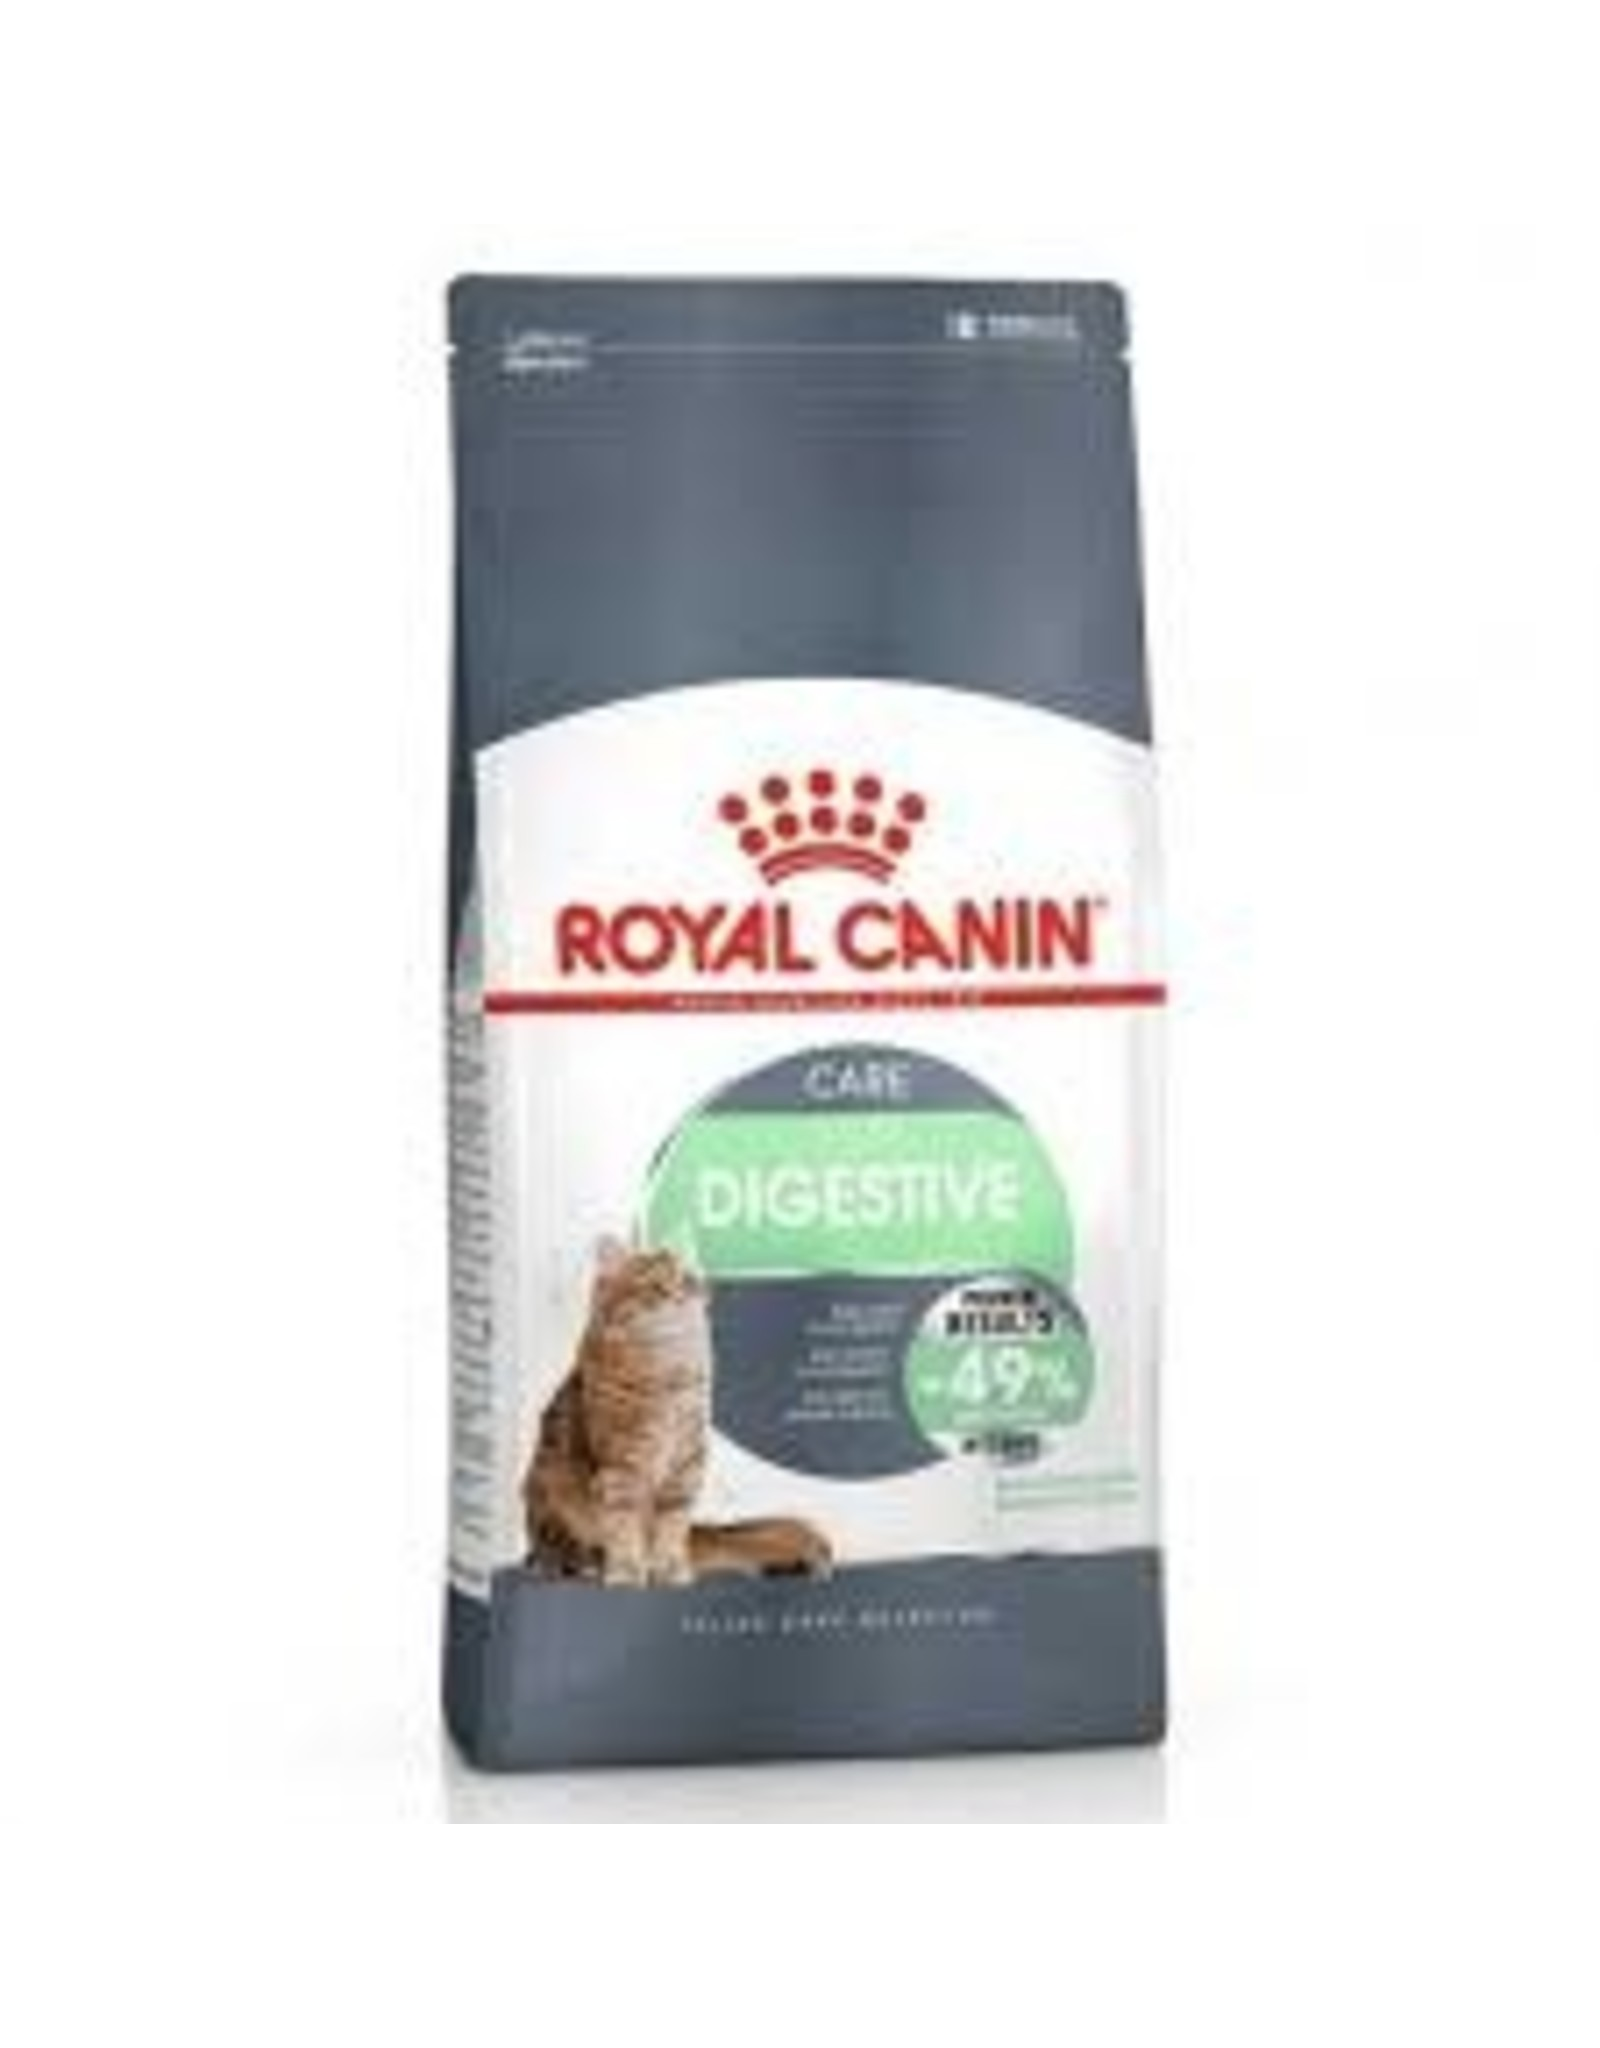 Royal Canin Royal Canin - Digestive Care Cat 14lb